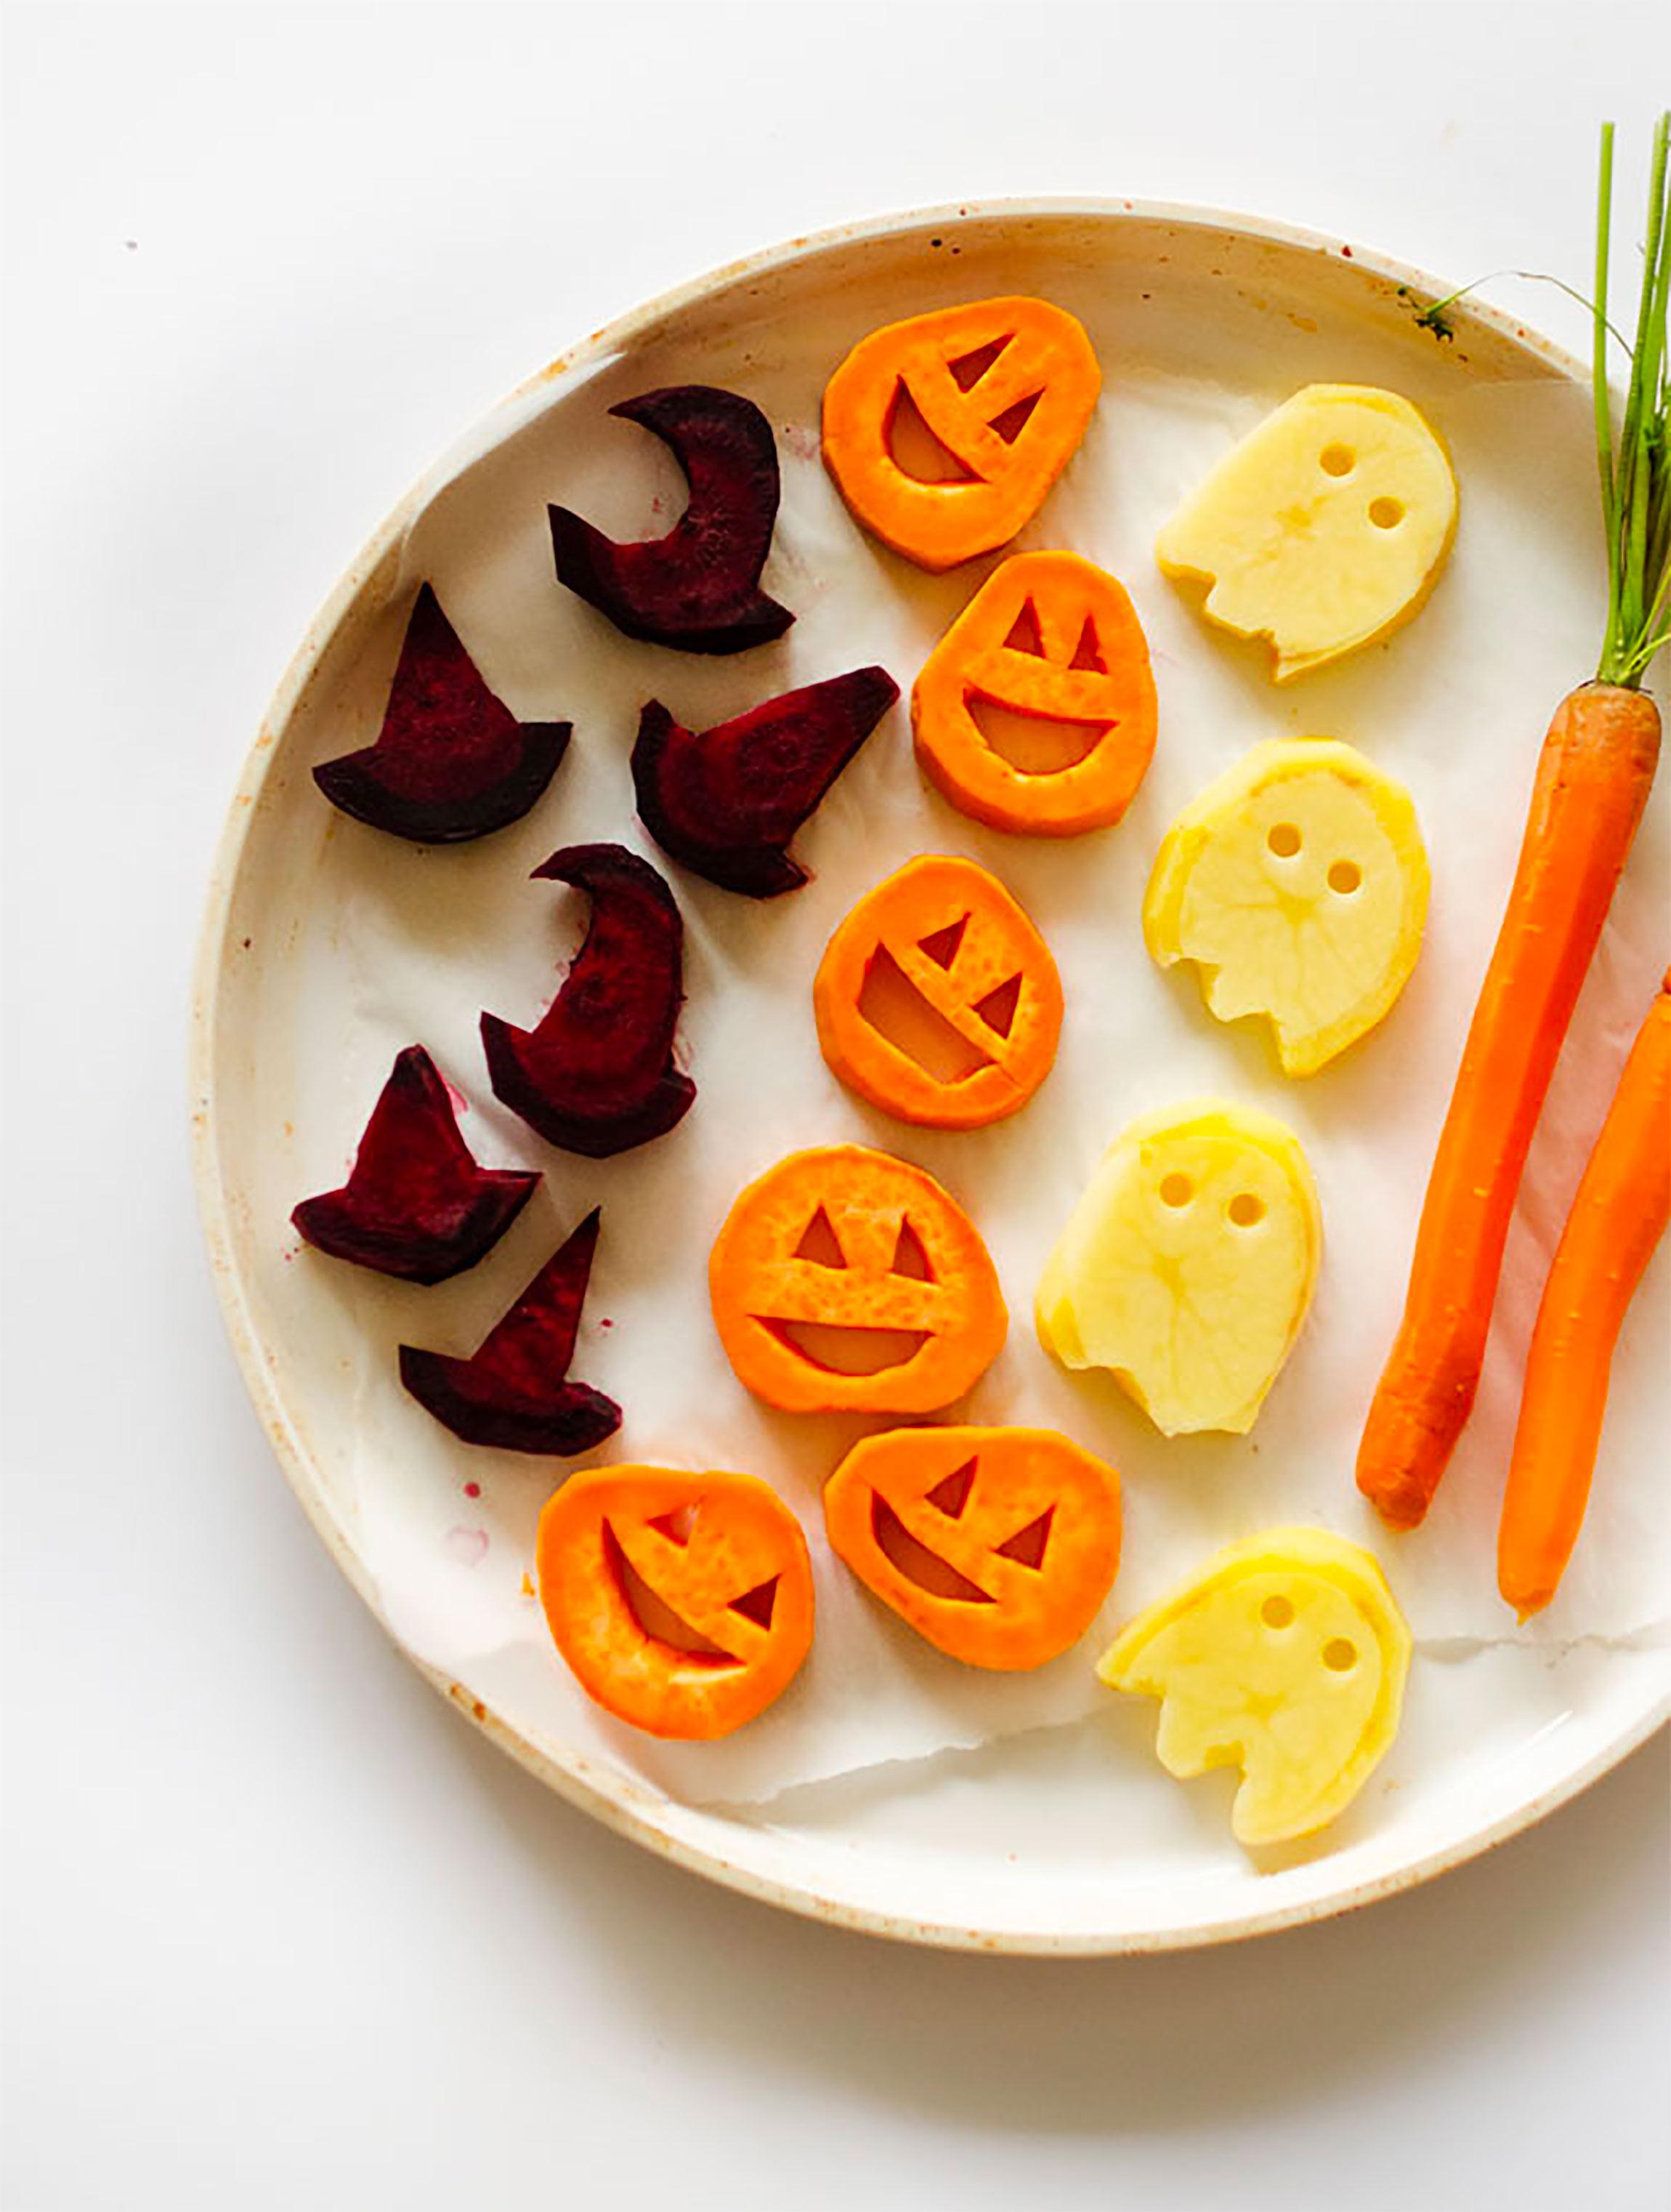 Healthy Halloween Snacks & Treats: Halloween Roasted Vegetables